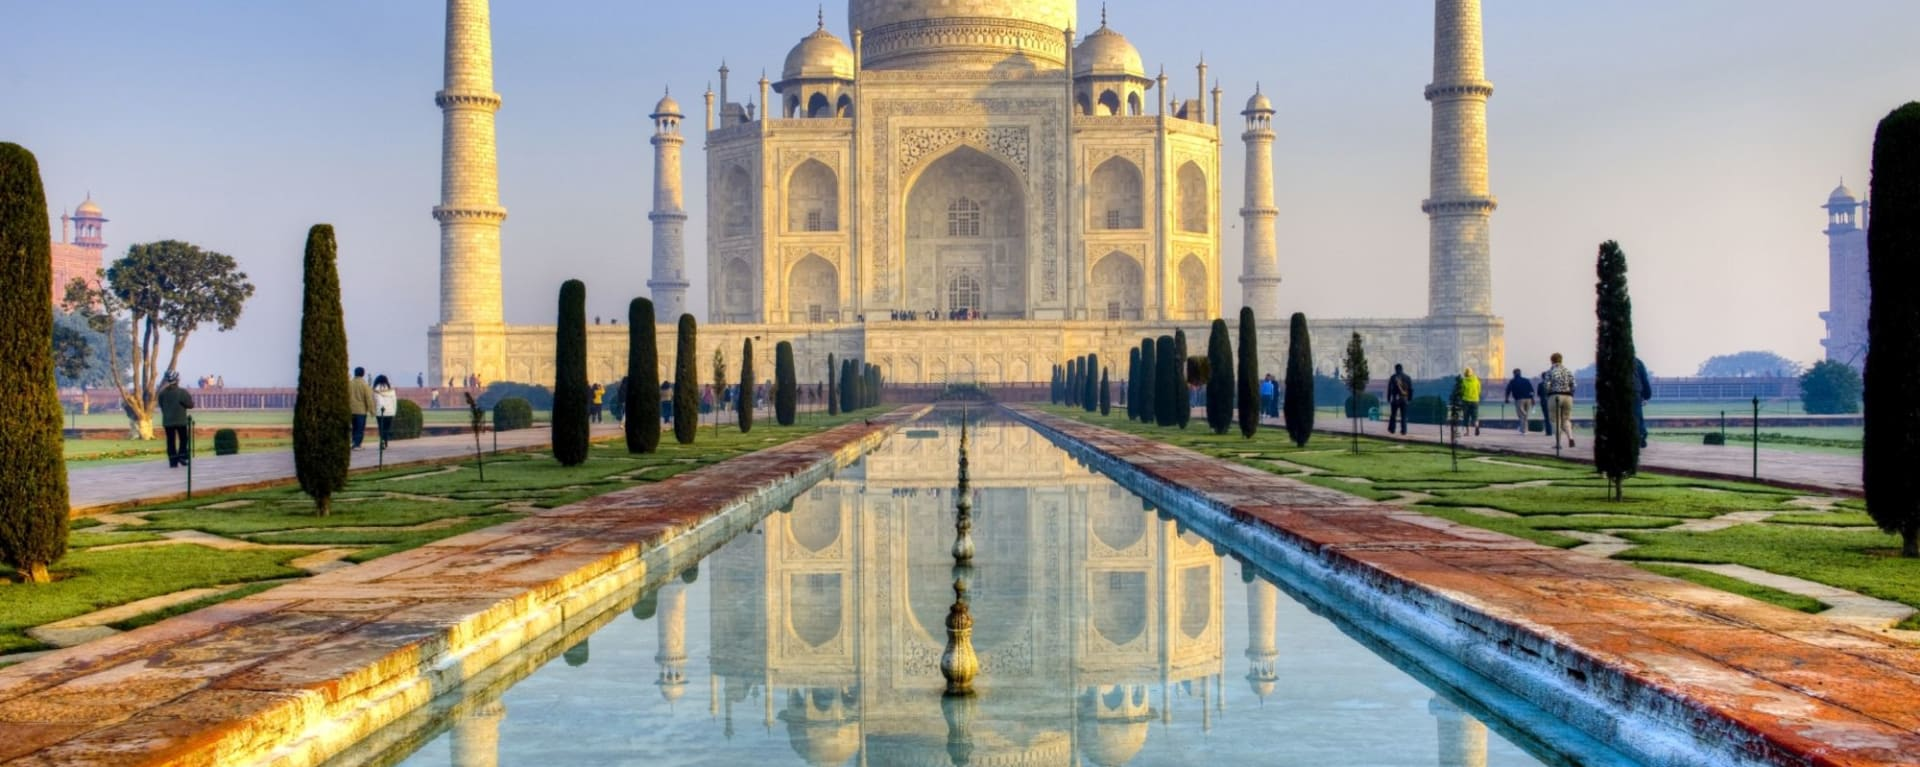 «The Deccan Odyssey» - L'éclat du Rajasthan de Mumbai: Agra Taj Mahal